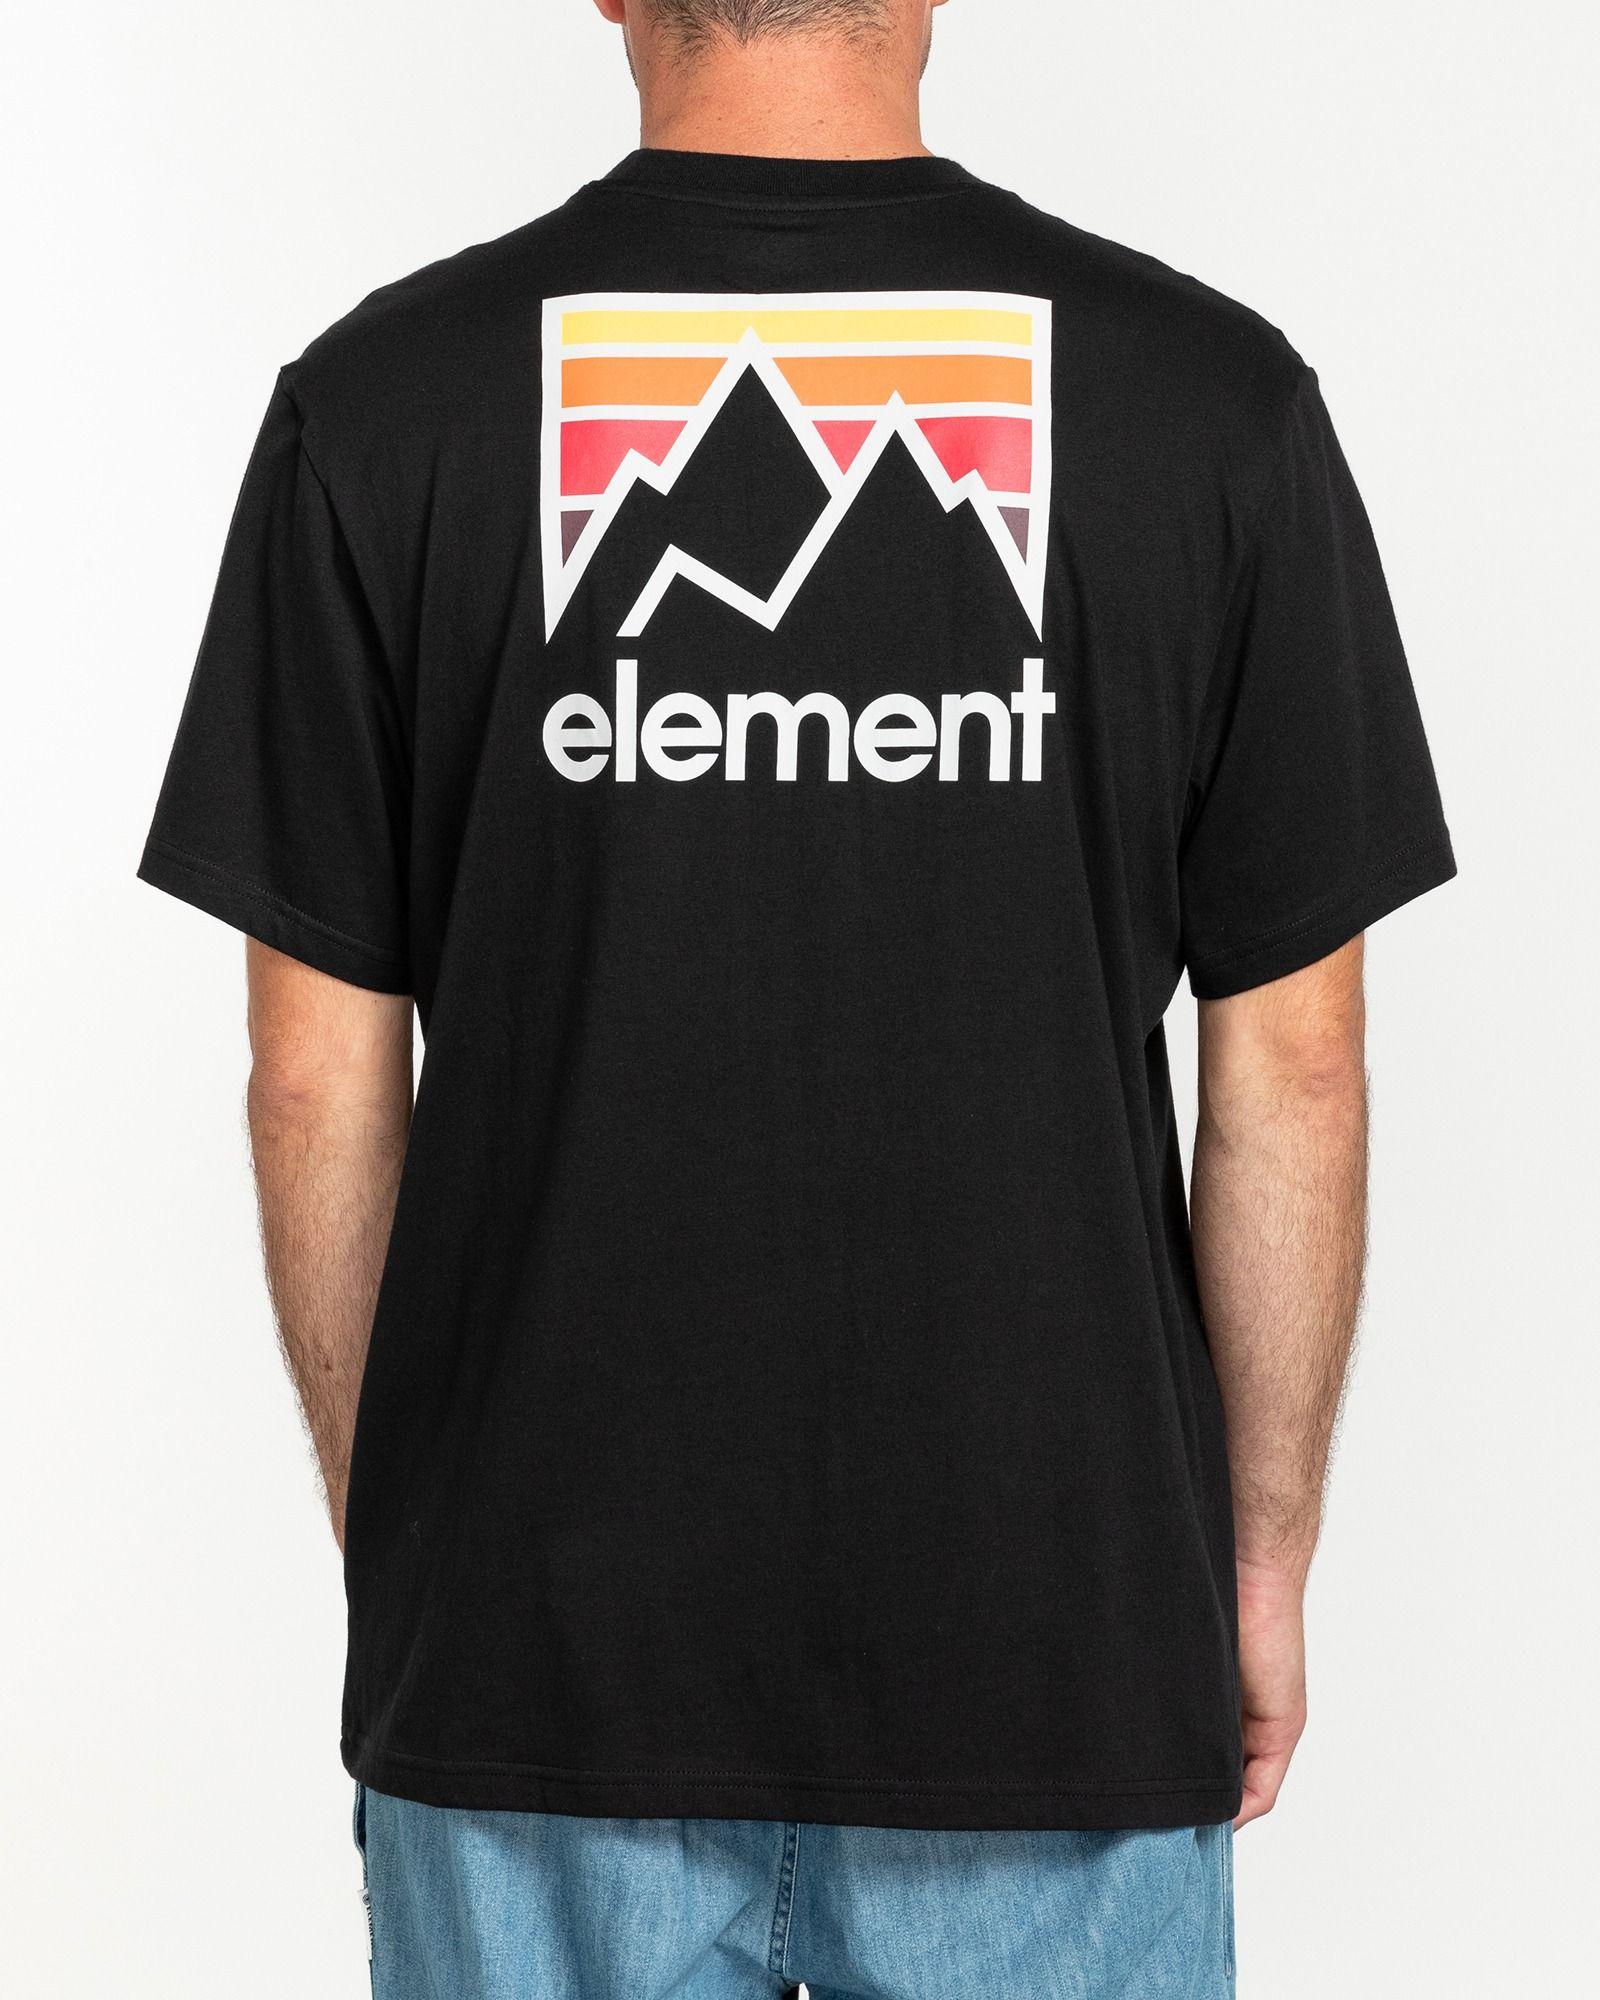 Element Joint t-shirt, flint black, small